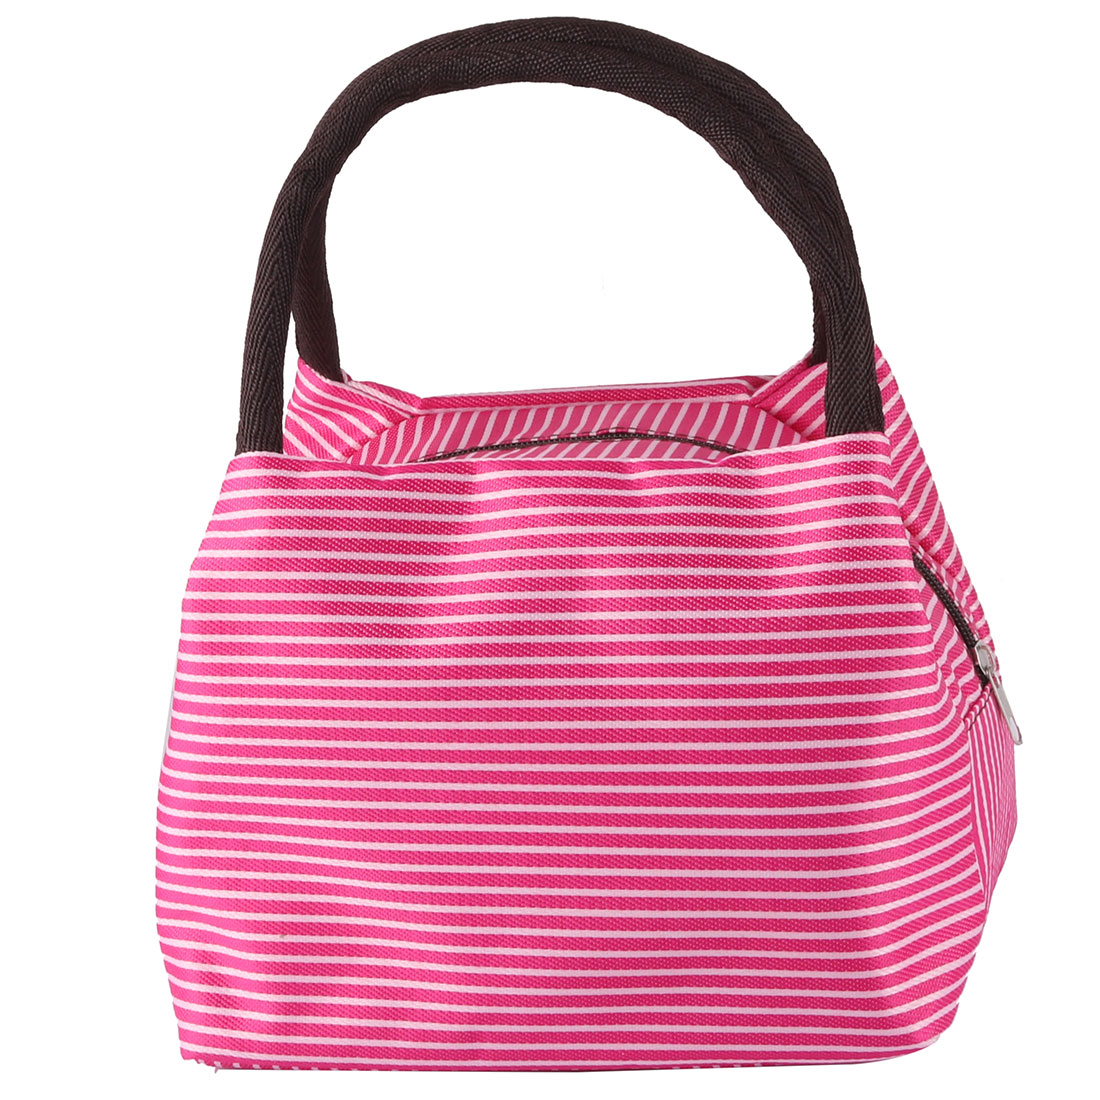 Outdoor Linen Cotton Stripe Pattern Lunch Holder Storage Cooler Pouch Tote Bag